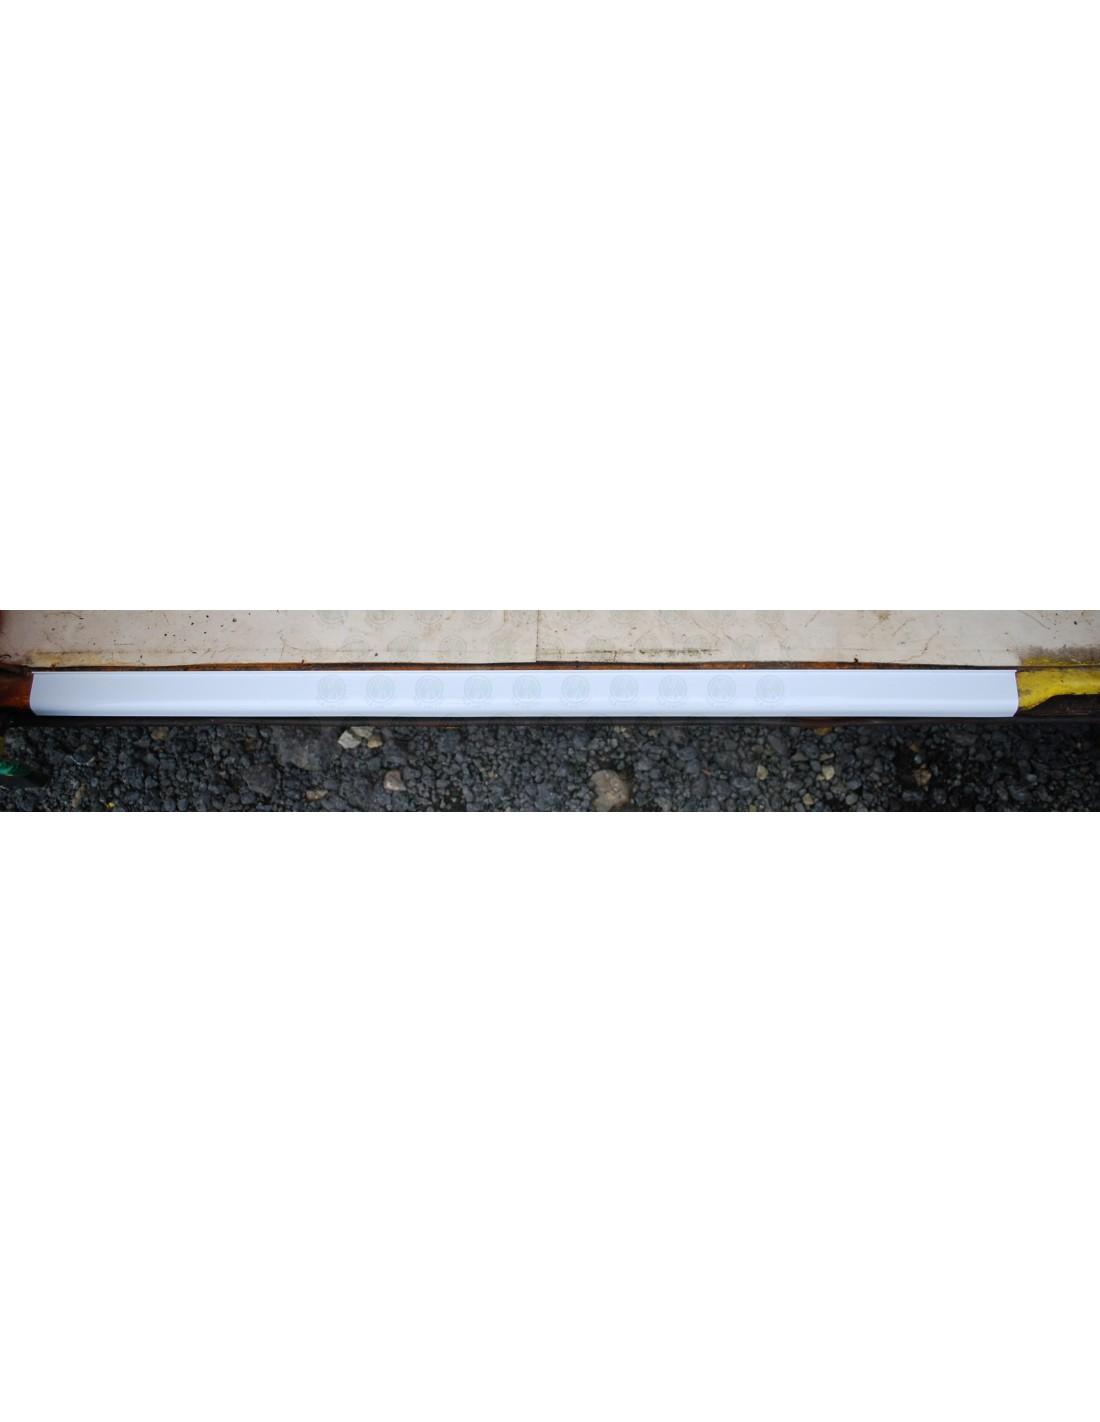 White floor edge trim for sliding door step nla vw parts for Floor edge trim